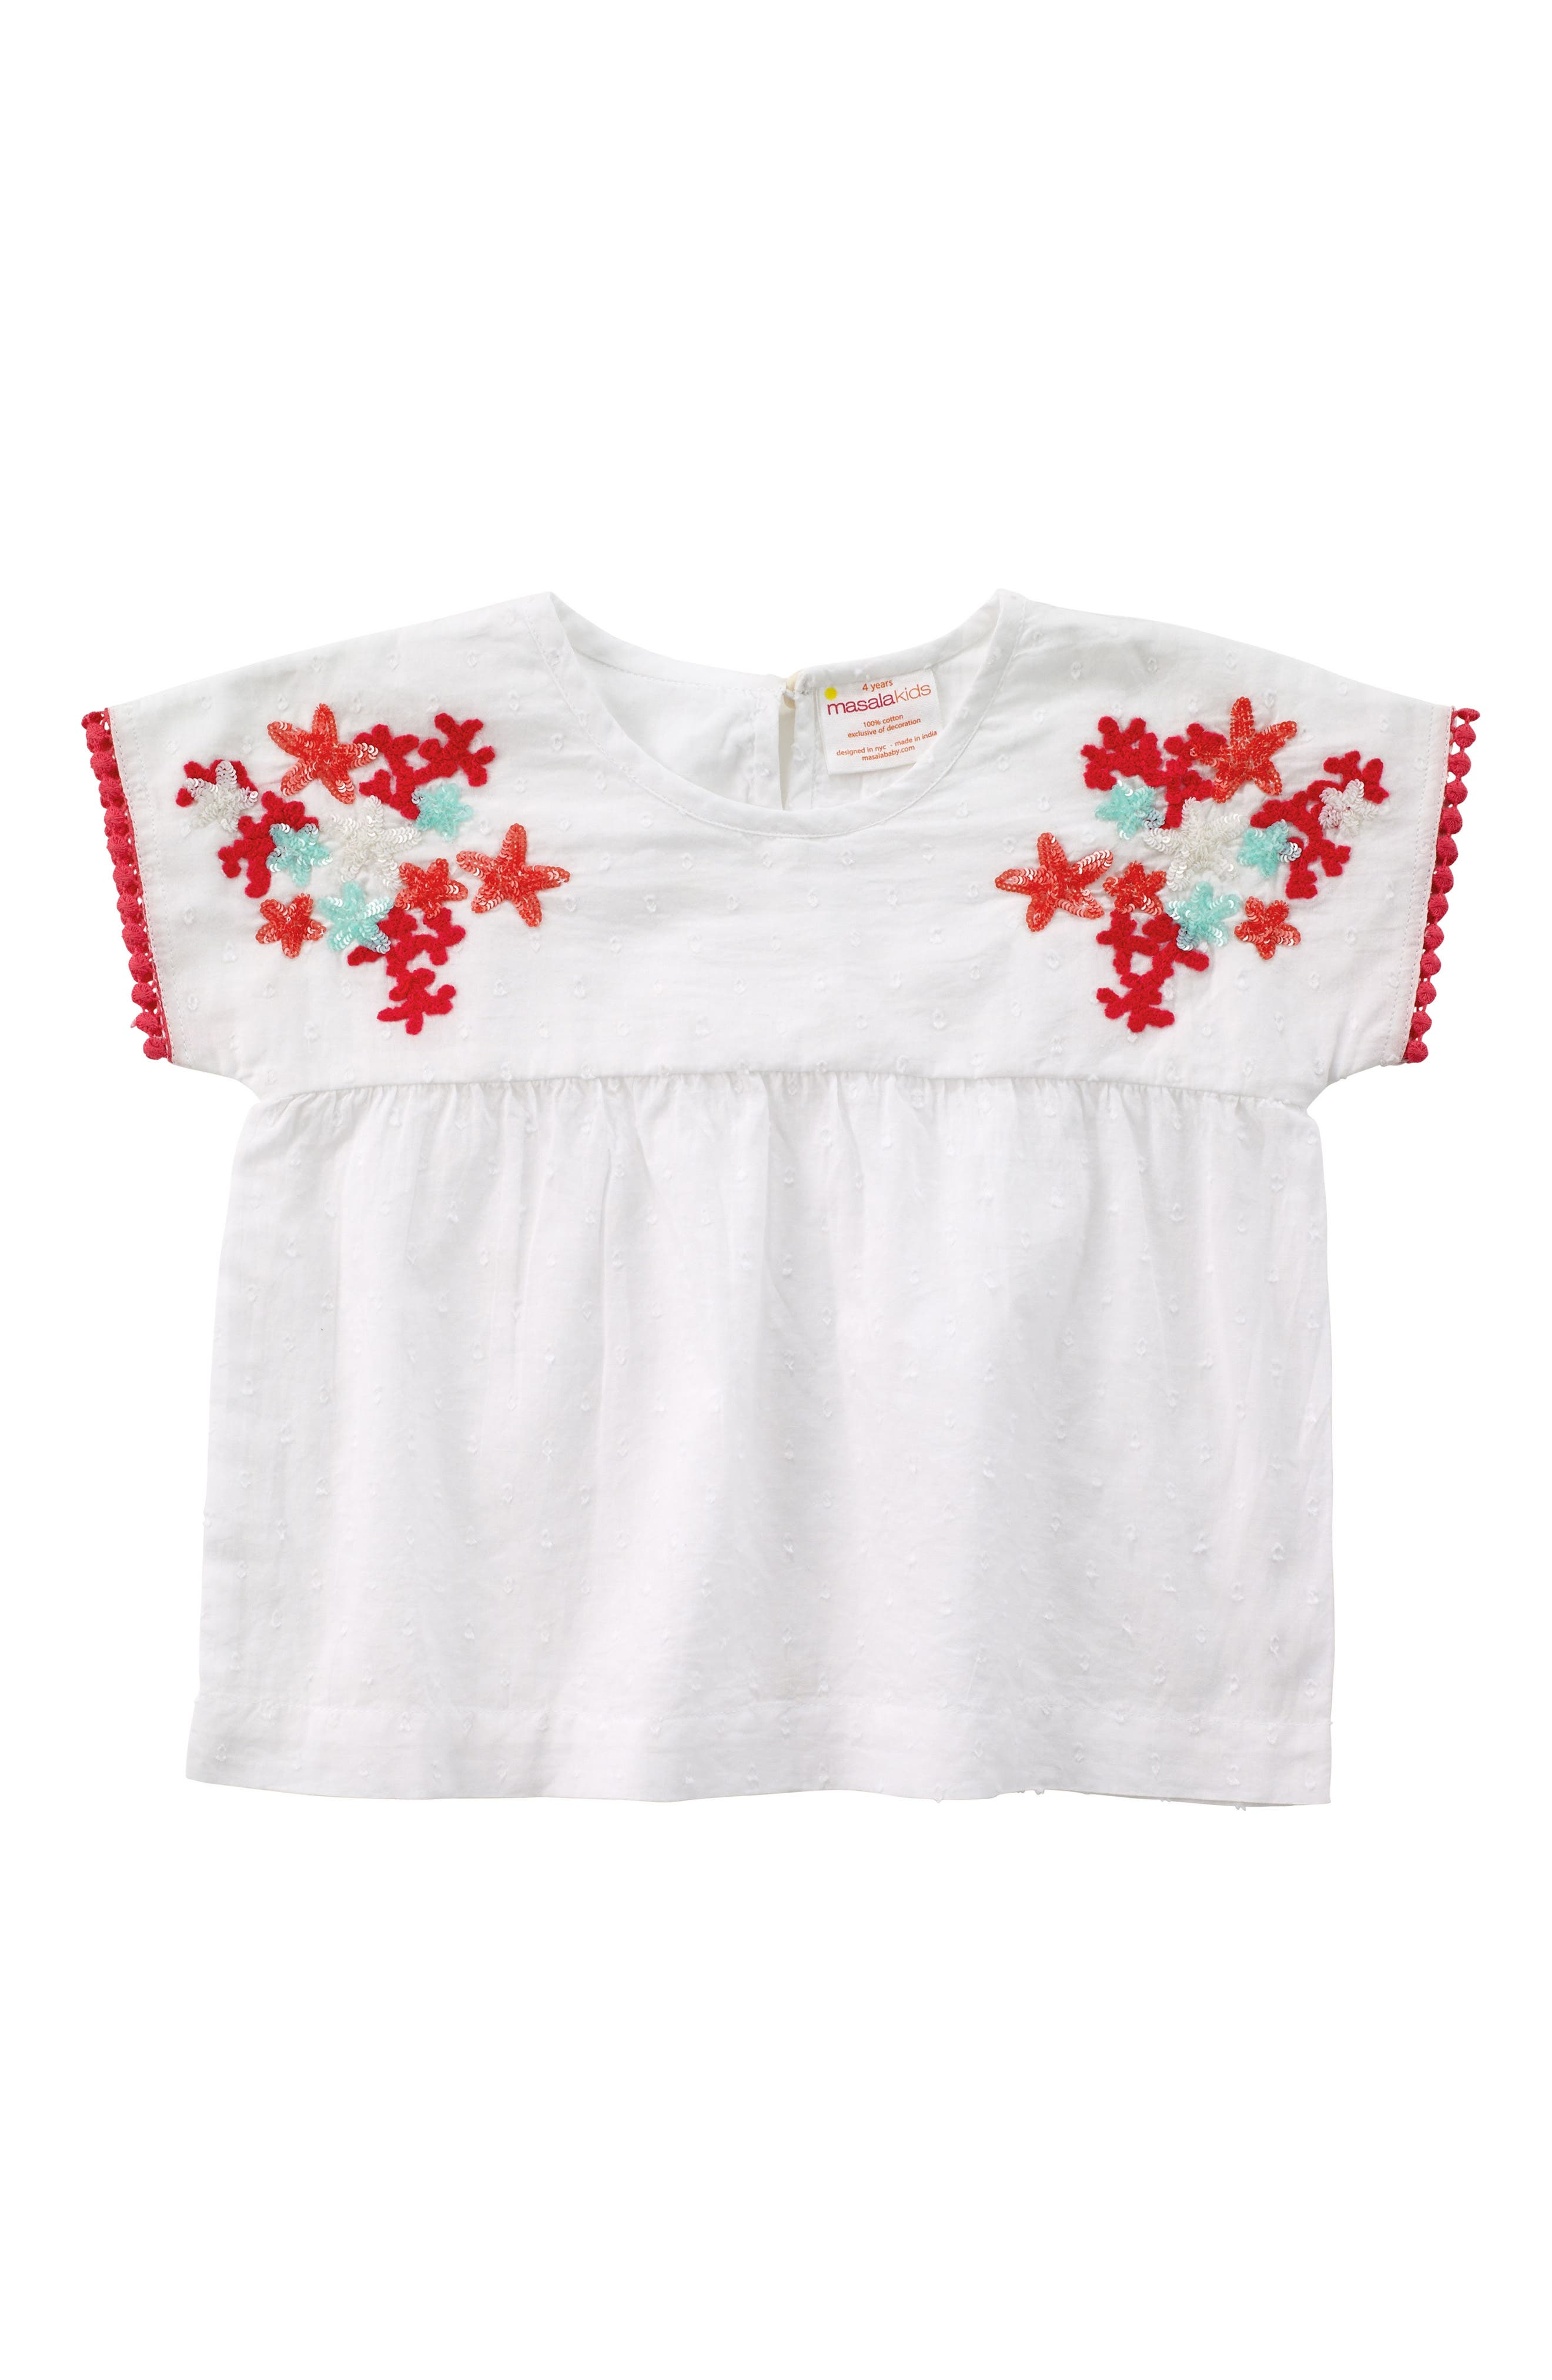 Alternate Image 1 Selected - Masalababy Kumari Embroidered Top (Toddler Girls, Little Girls & Big Girls)